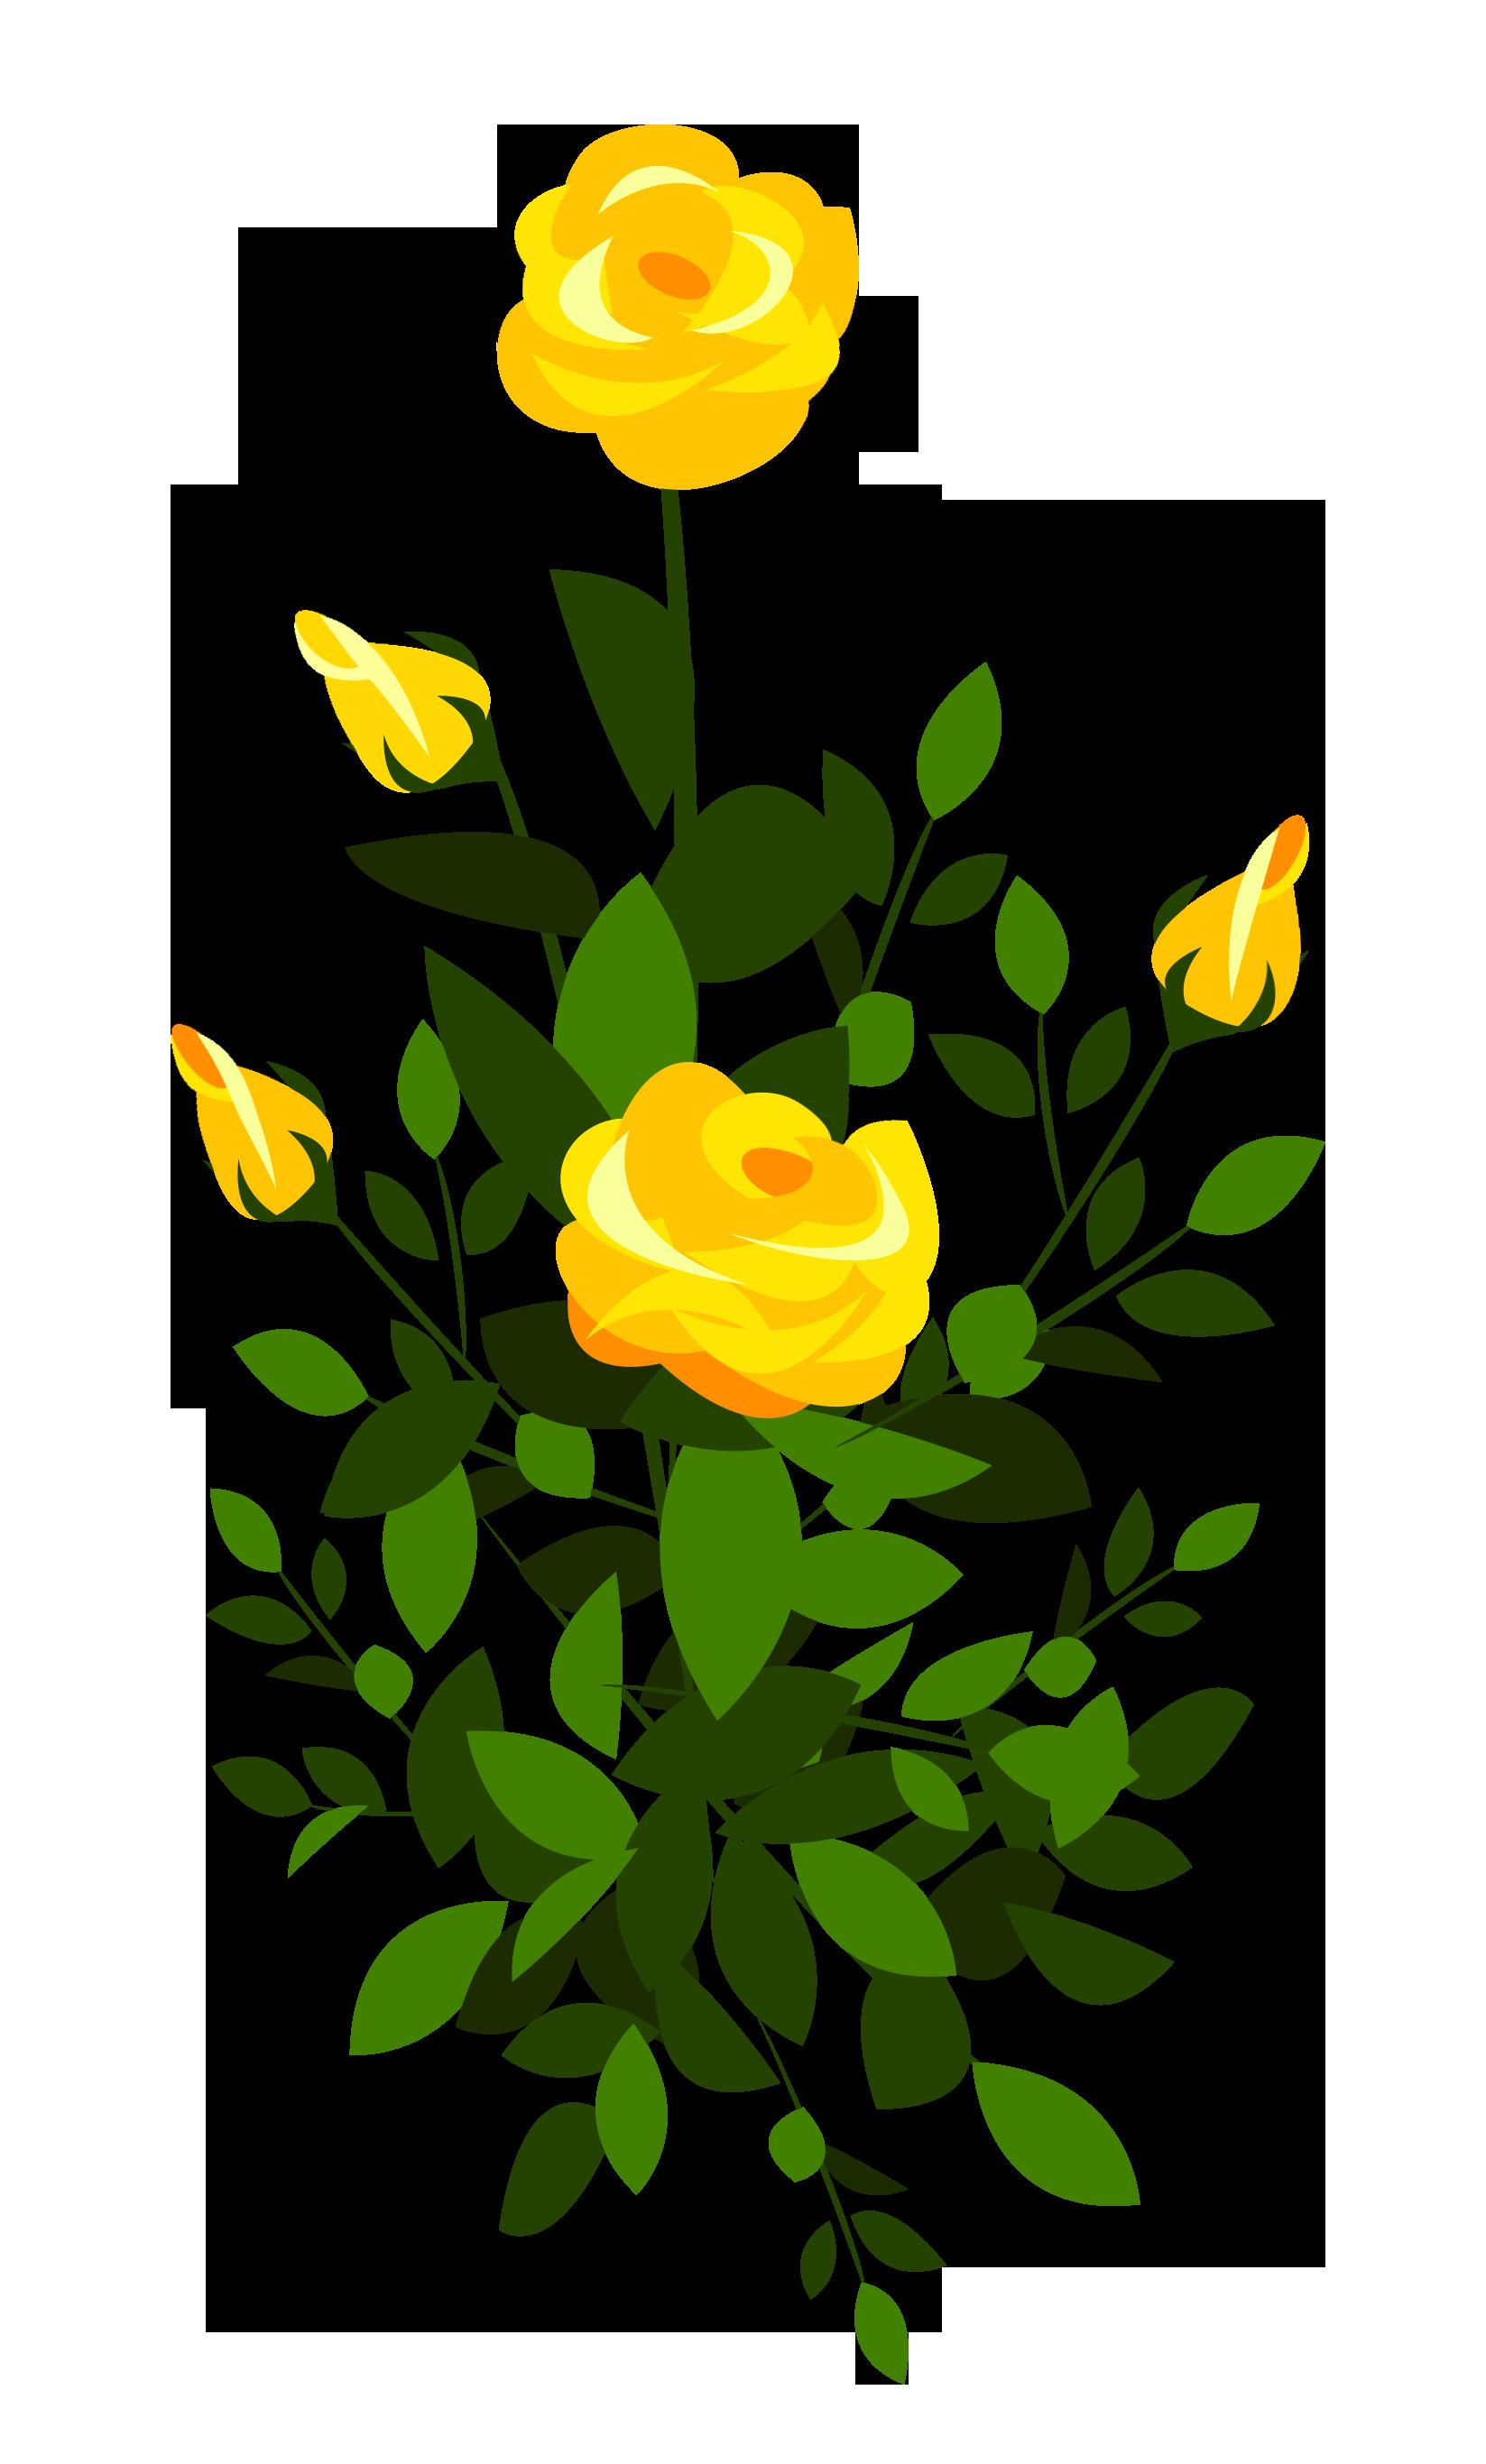 Pin by marija on. Bush clipart flower